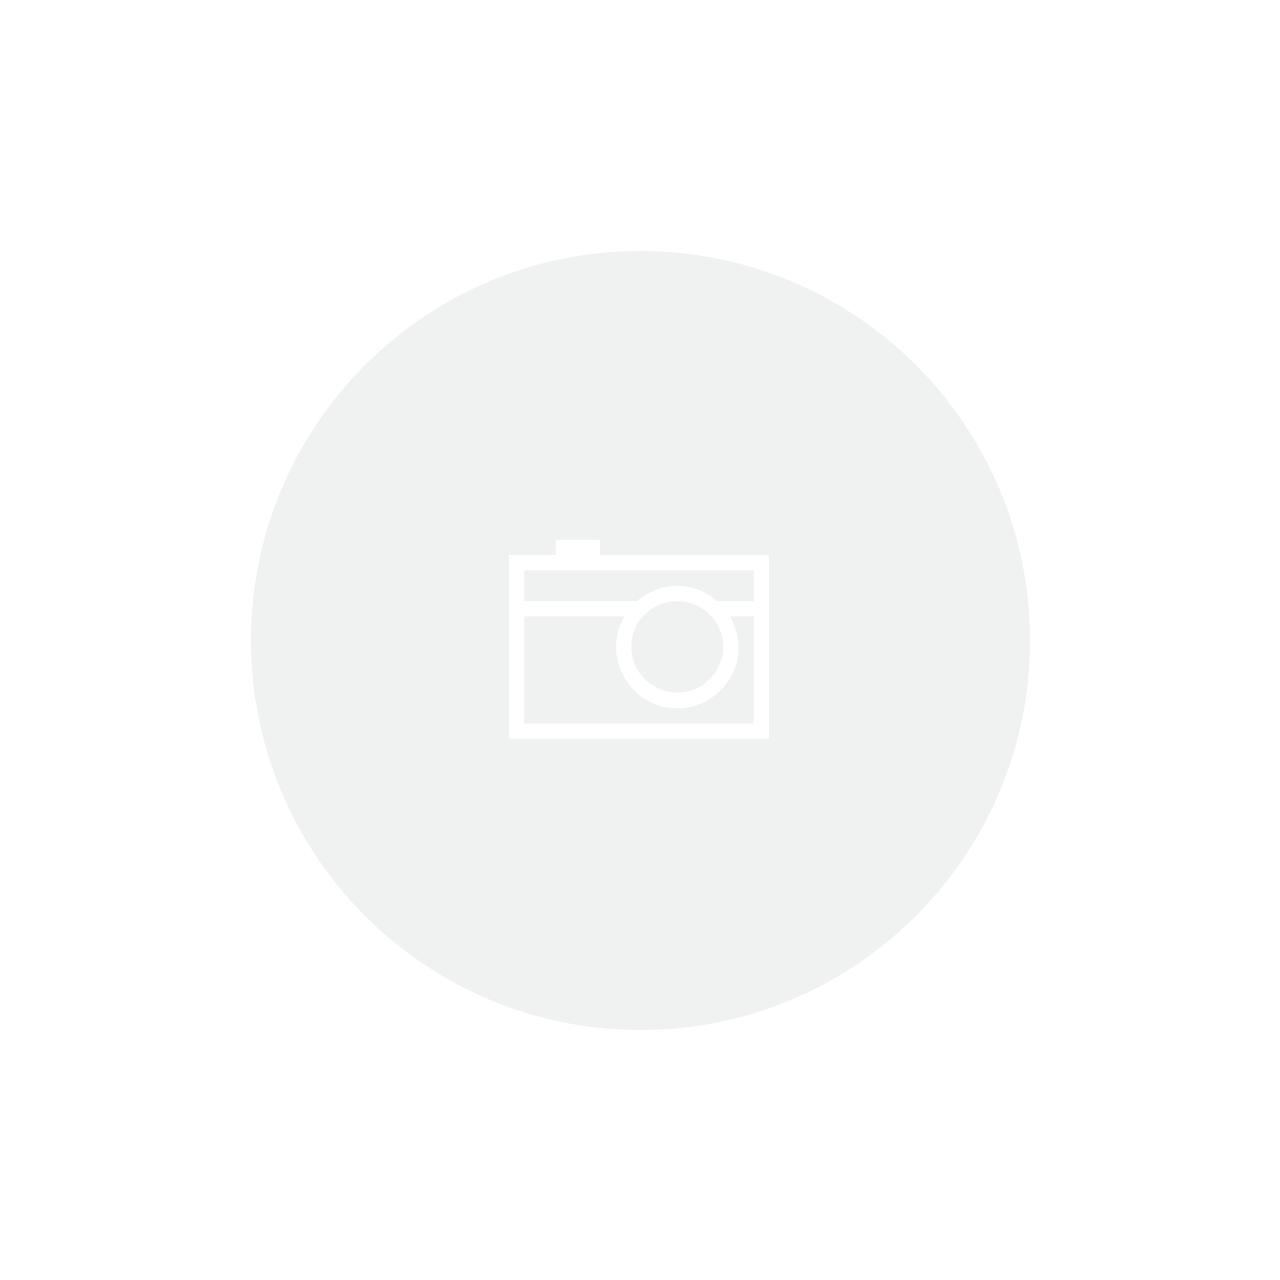 Mouse Pad Akasa Venom Gaming - AK-MPD-02YL01